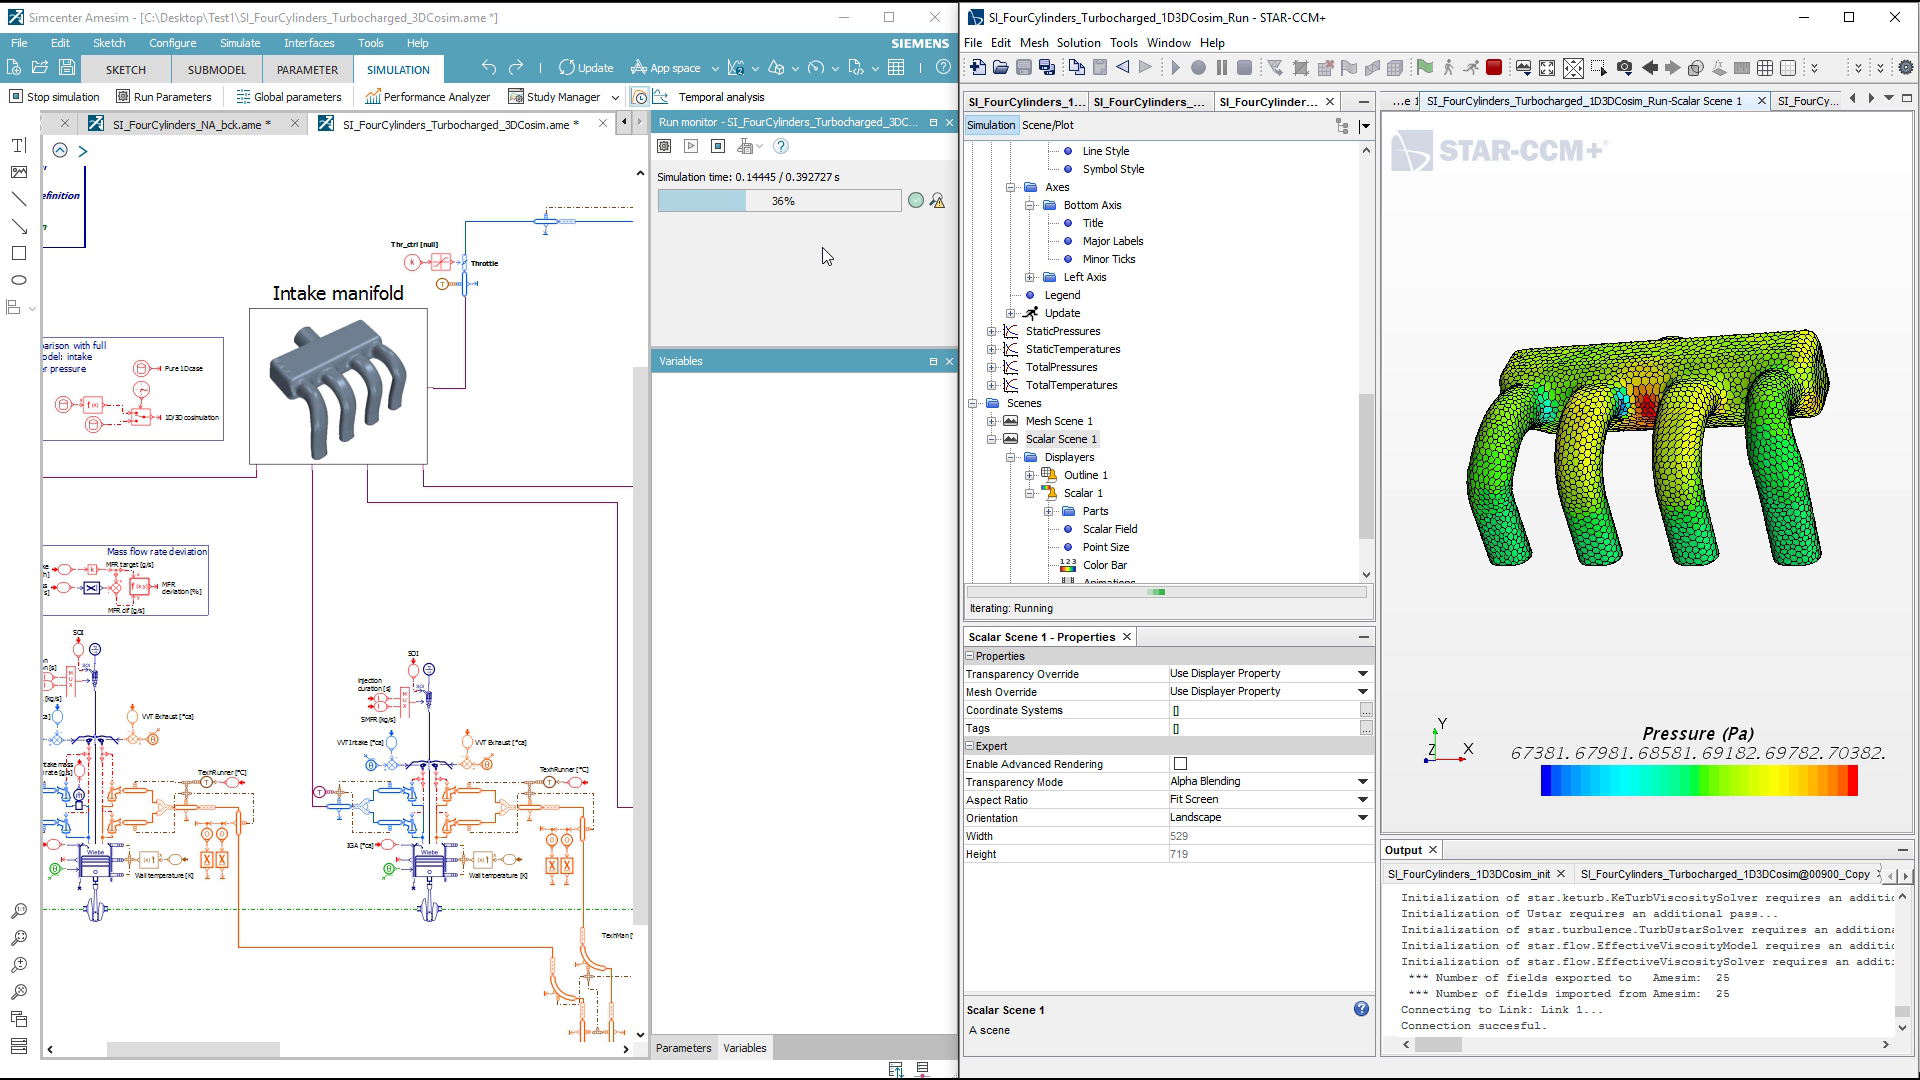 Siemens Releases Version 17 of Simcenter Amesim - Digital